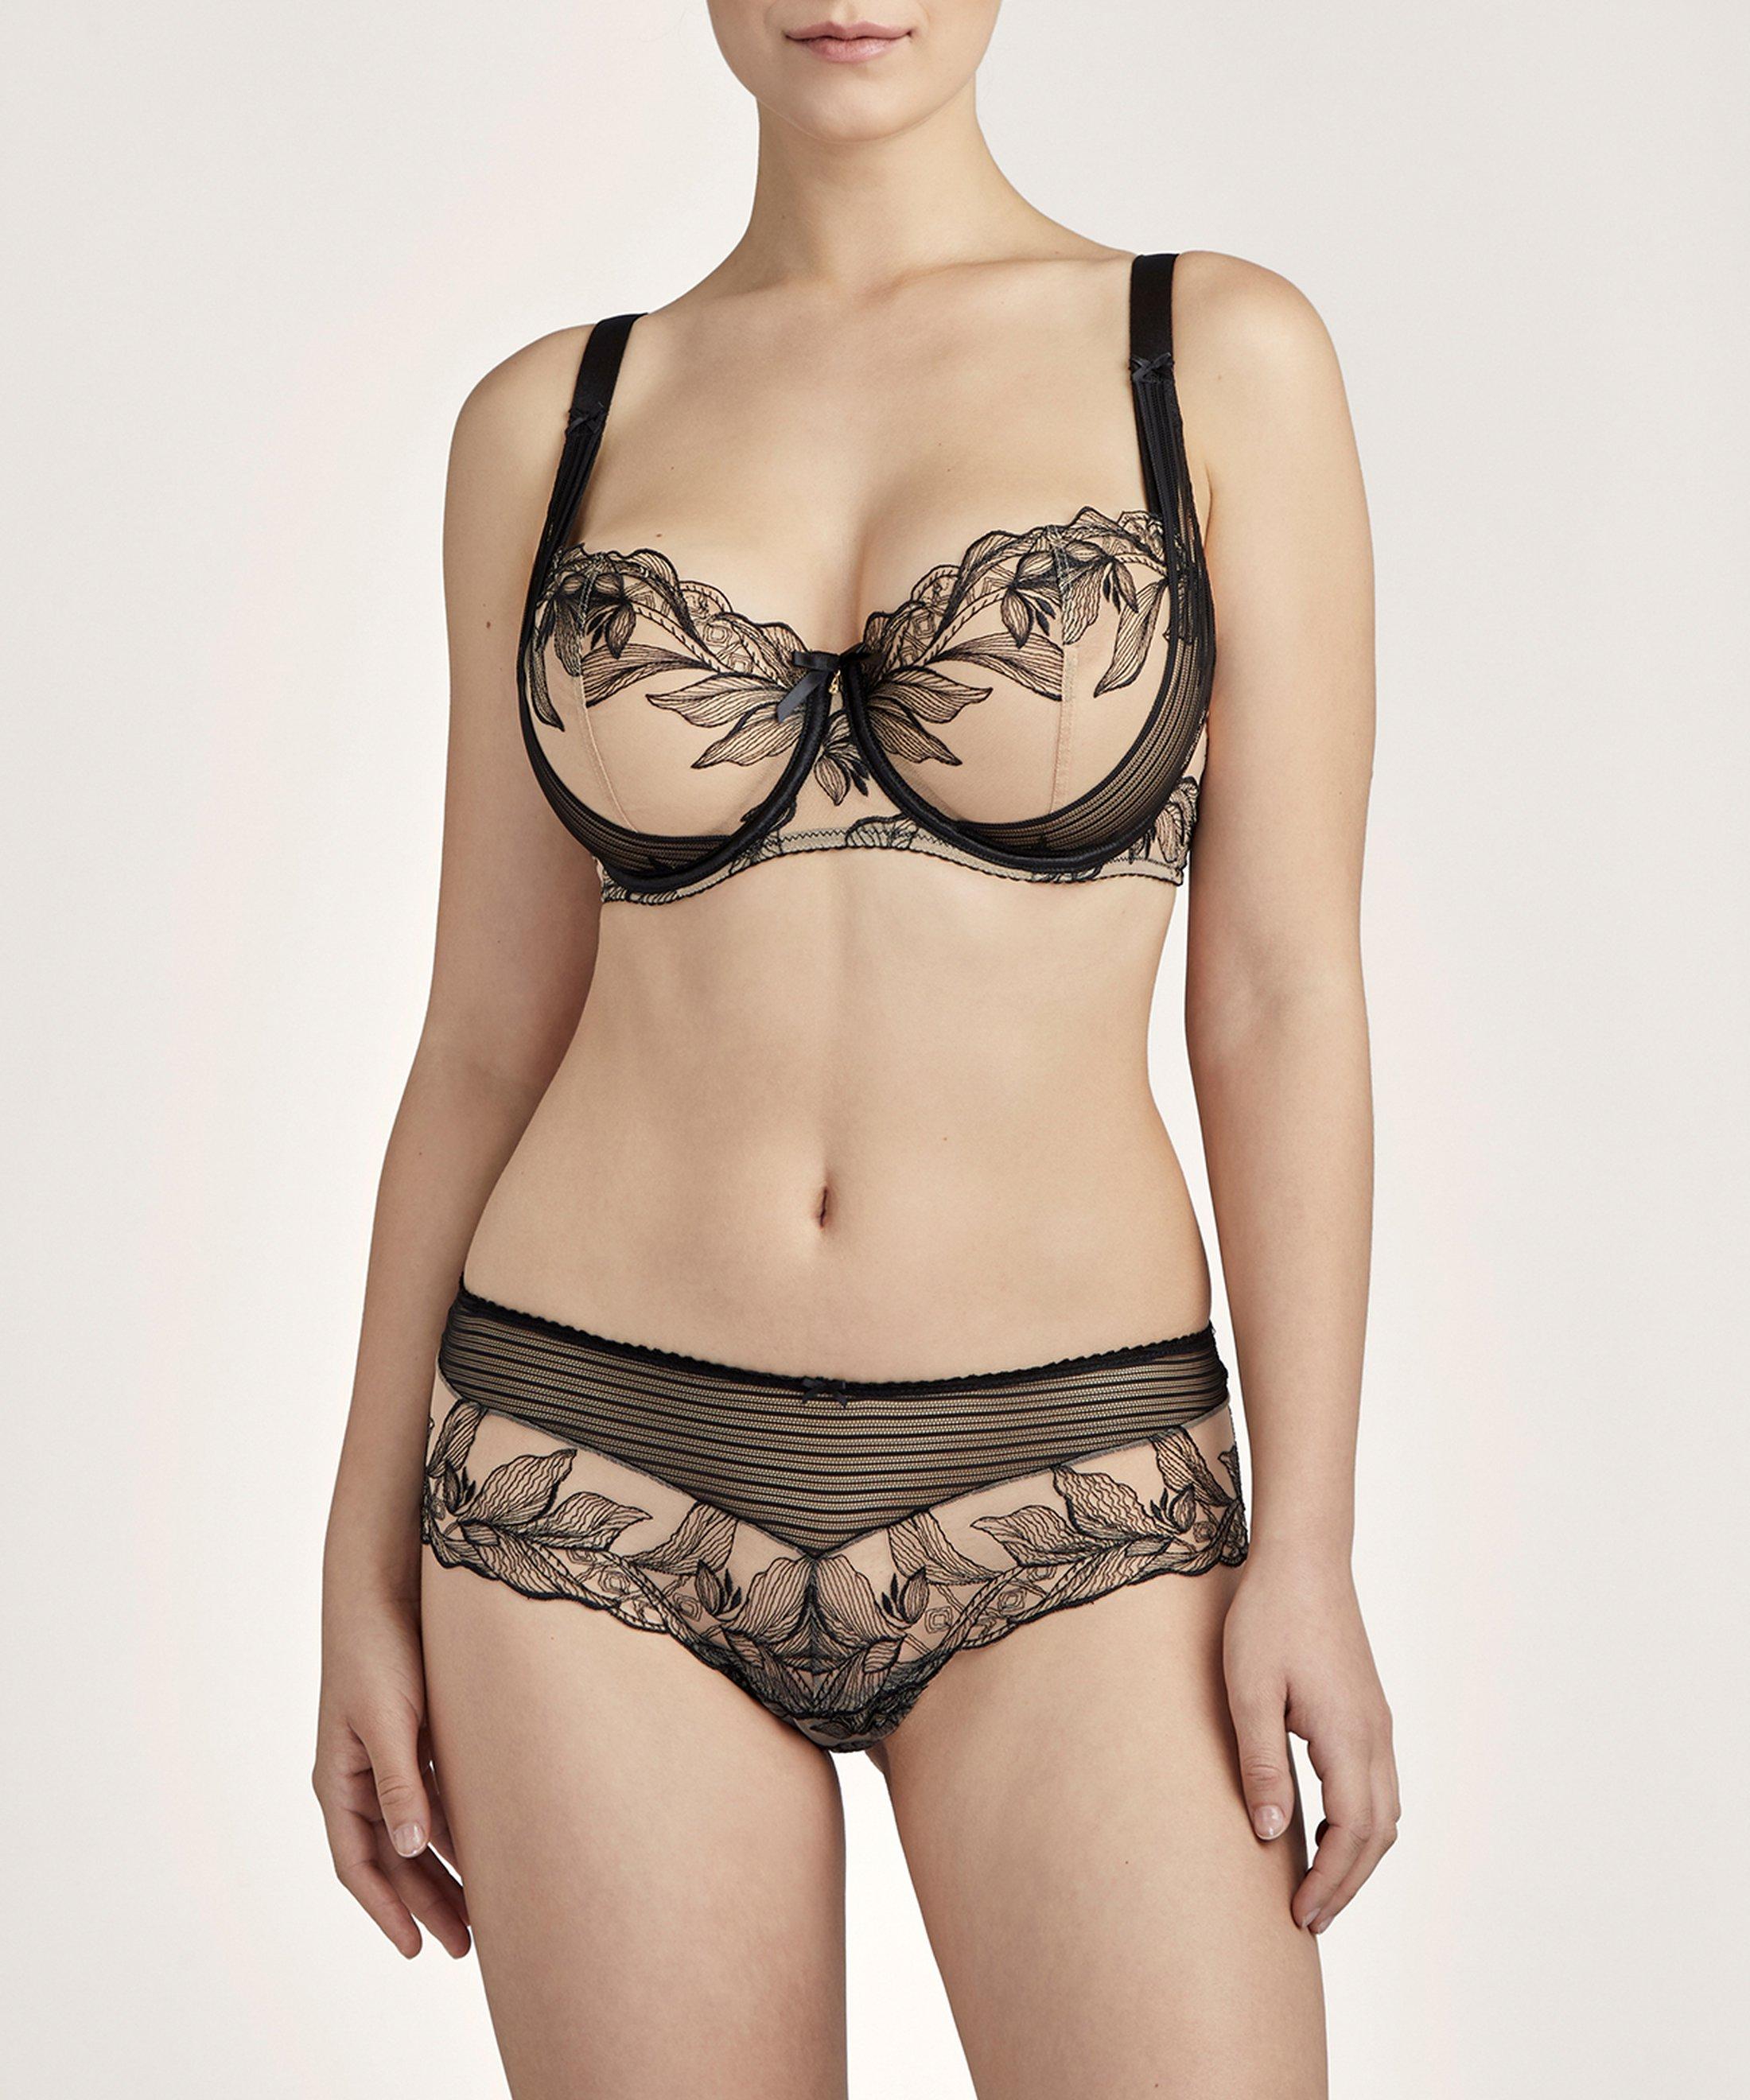 FLEUR DE TATTOO Comfort Half cup bra Black Encre Noire | Aubade